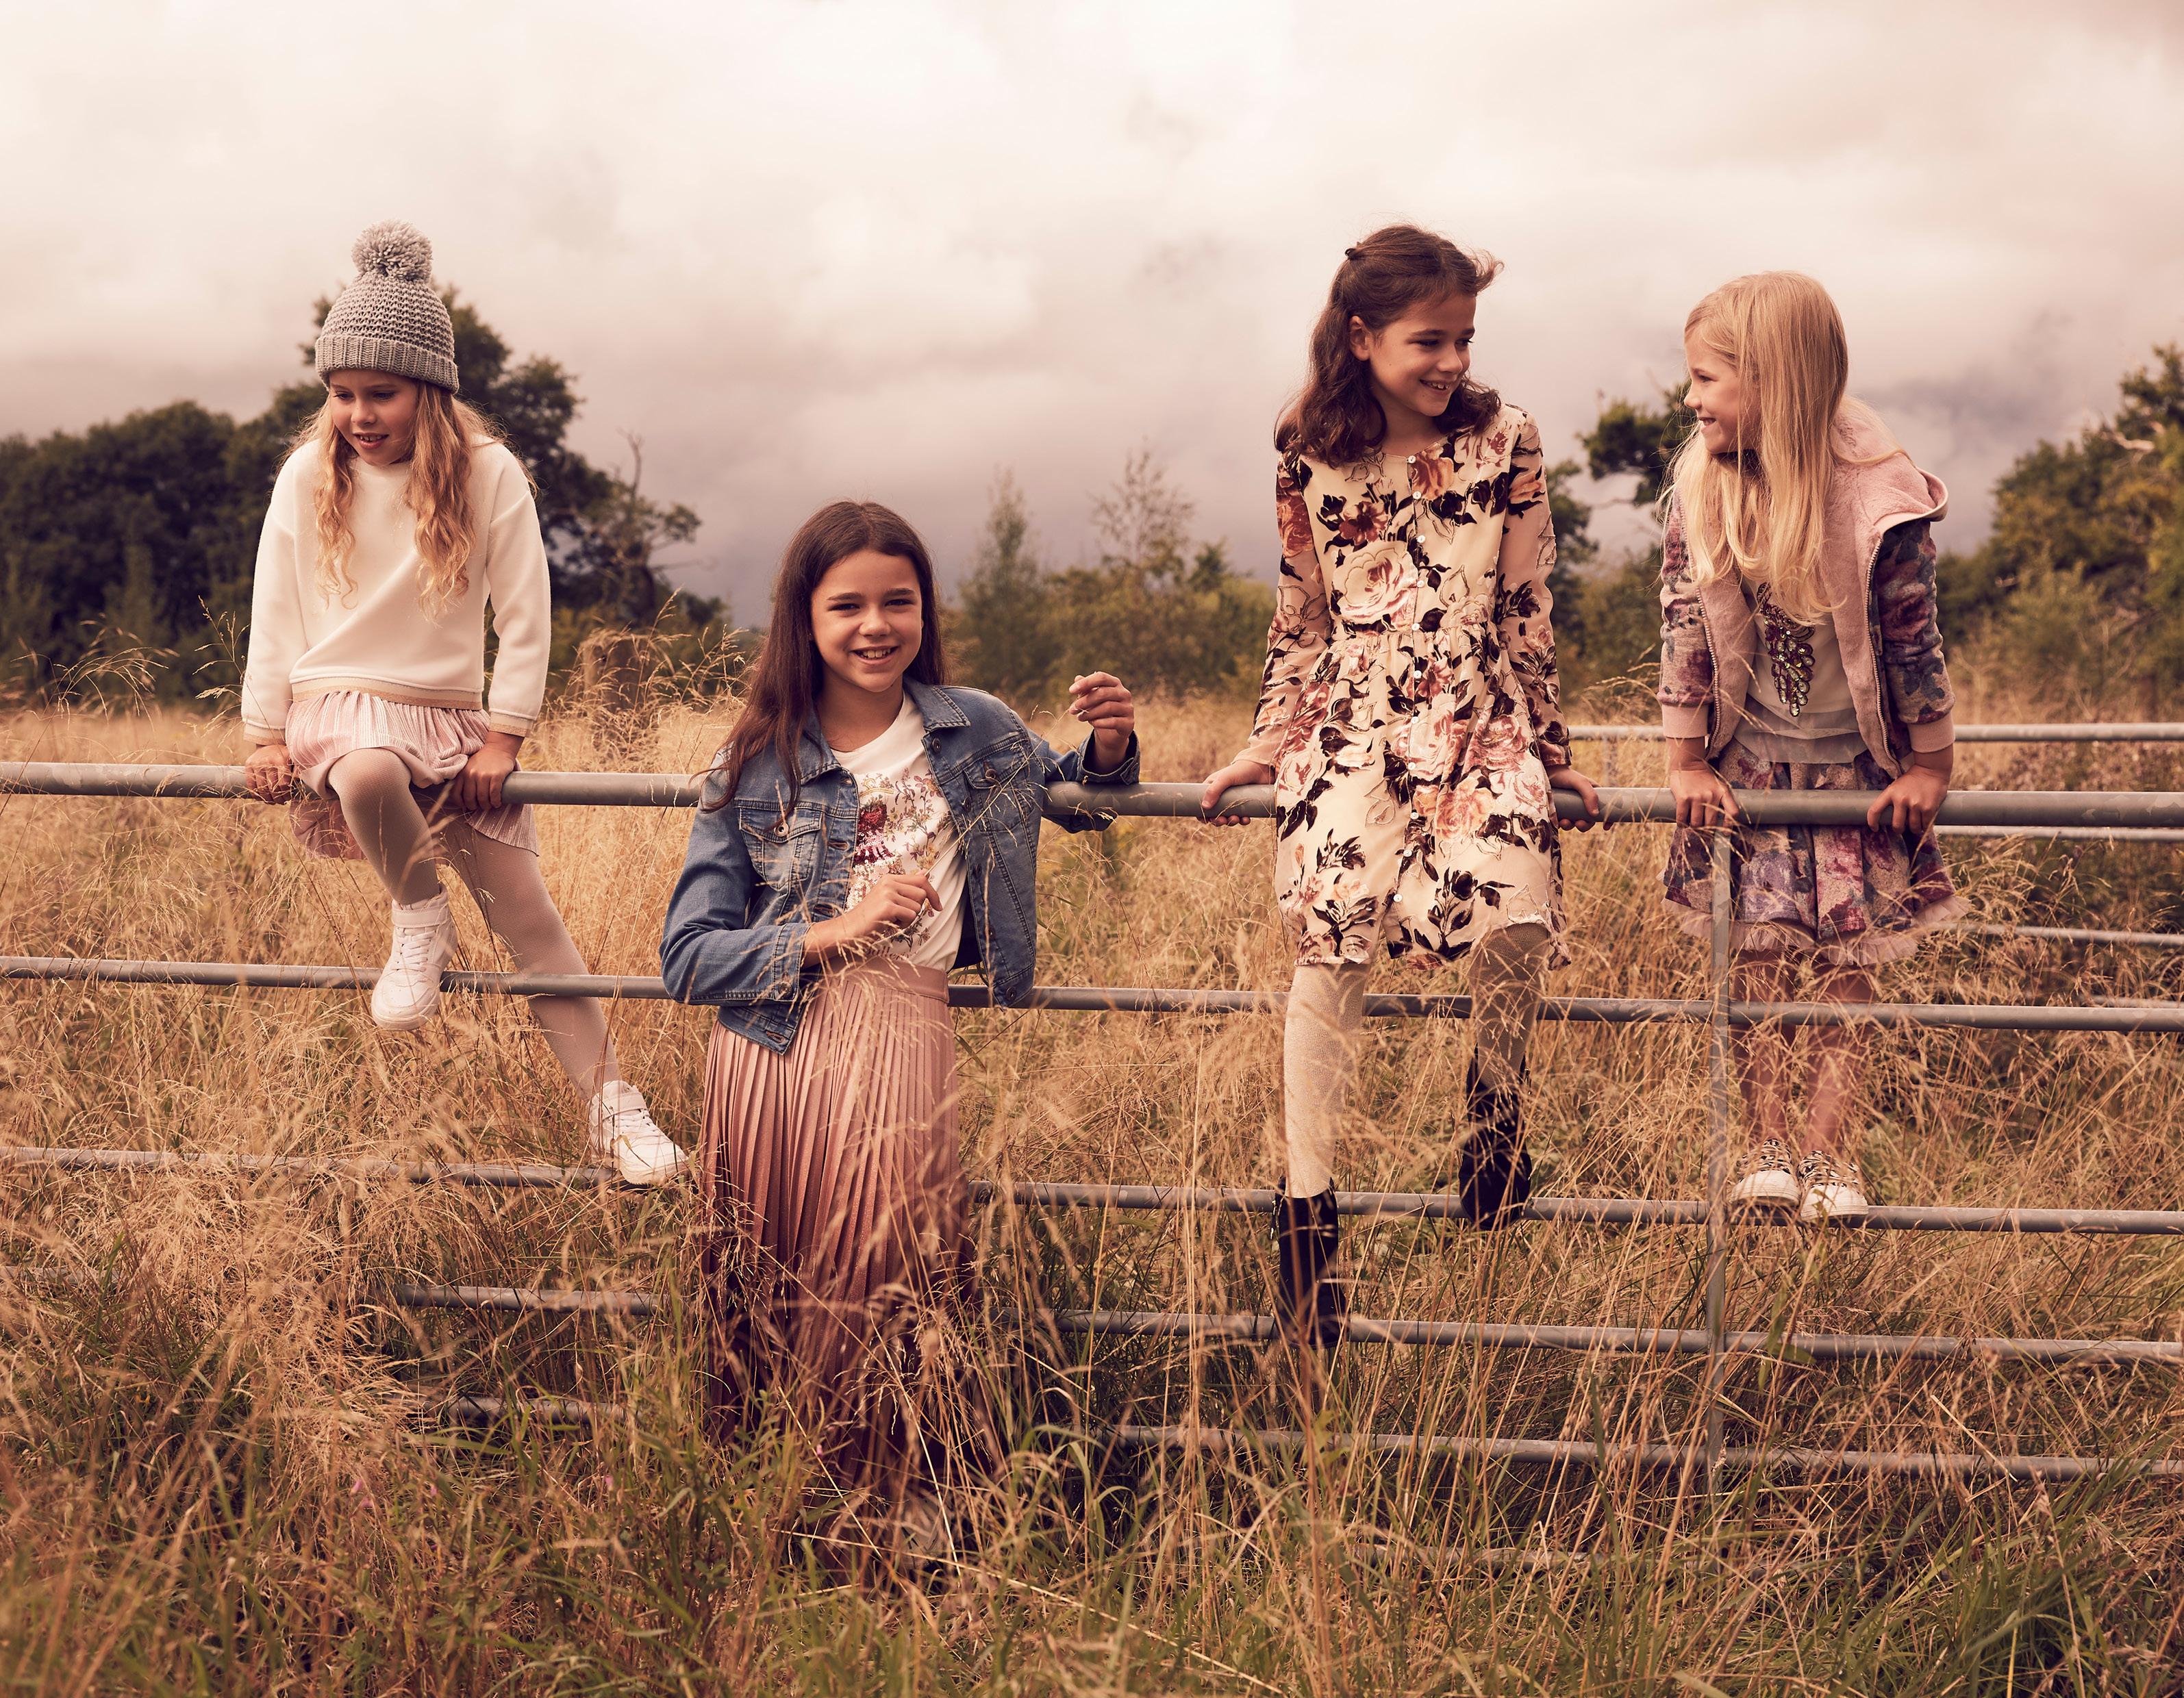 FG4_GIRLS BANNERS7